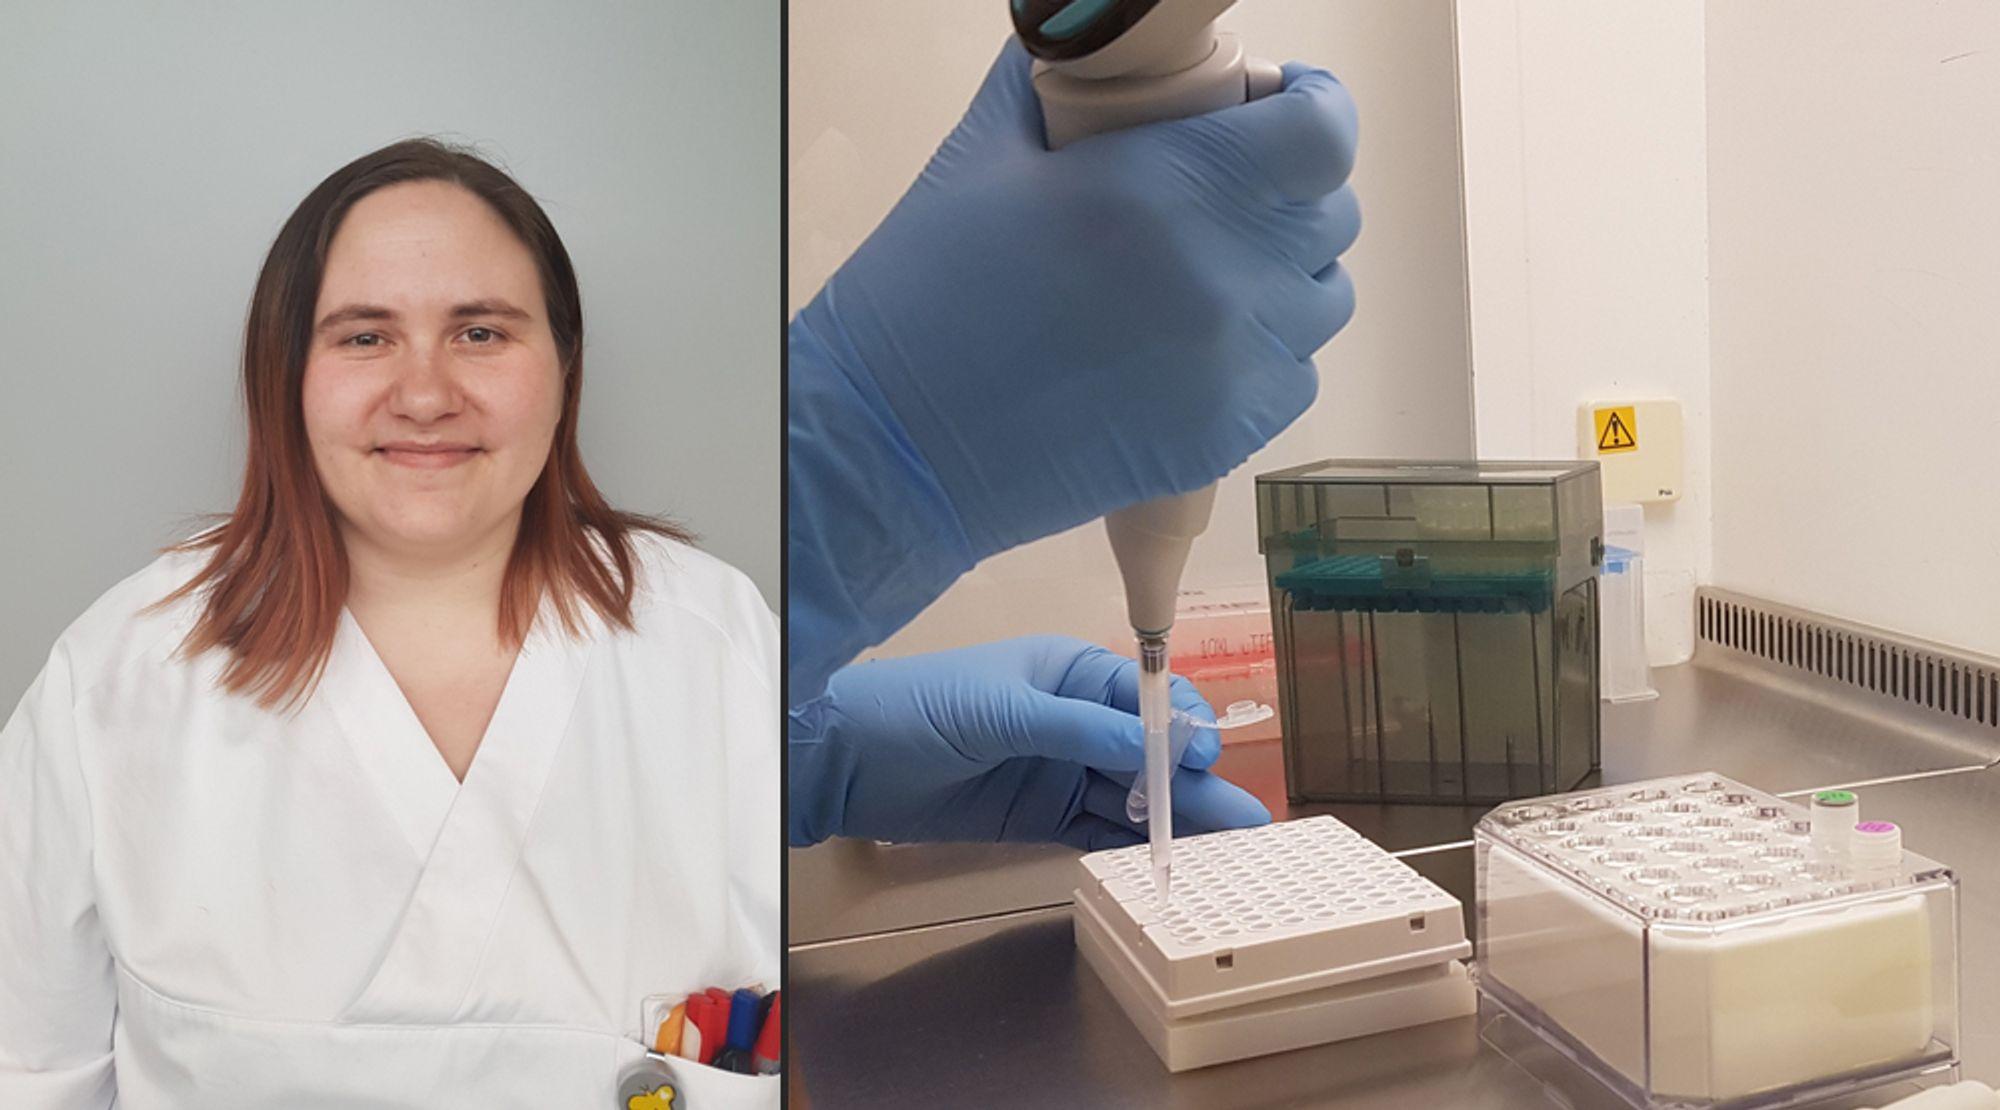 Det personellet som trengs for analysering er bioingeniører, og de er en økende mangelvare i Norge. I februar 2020 slo Nito alarm om at framtidig mangel på bioingeniører er en varslet krise i helsevesenet, skriver Silje Nysted Hagen.